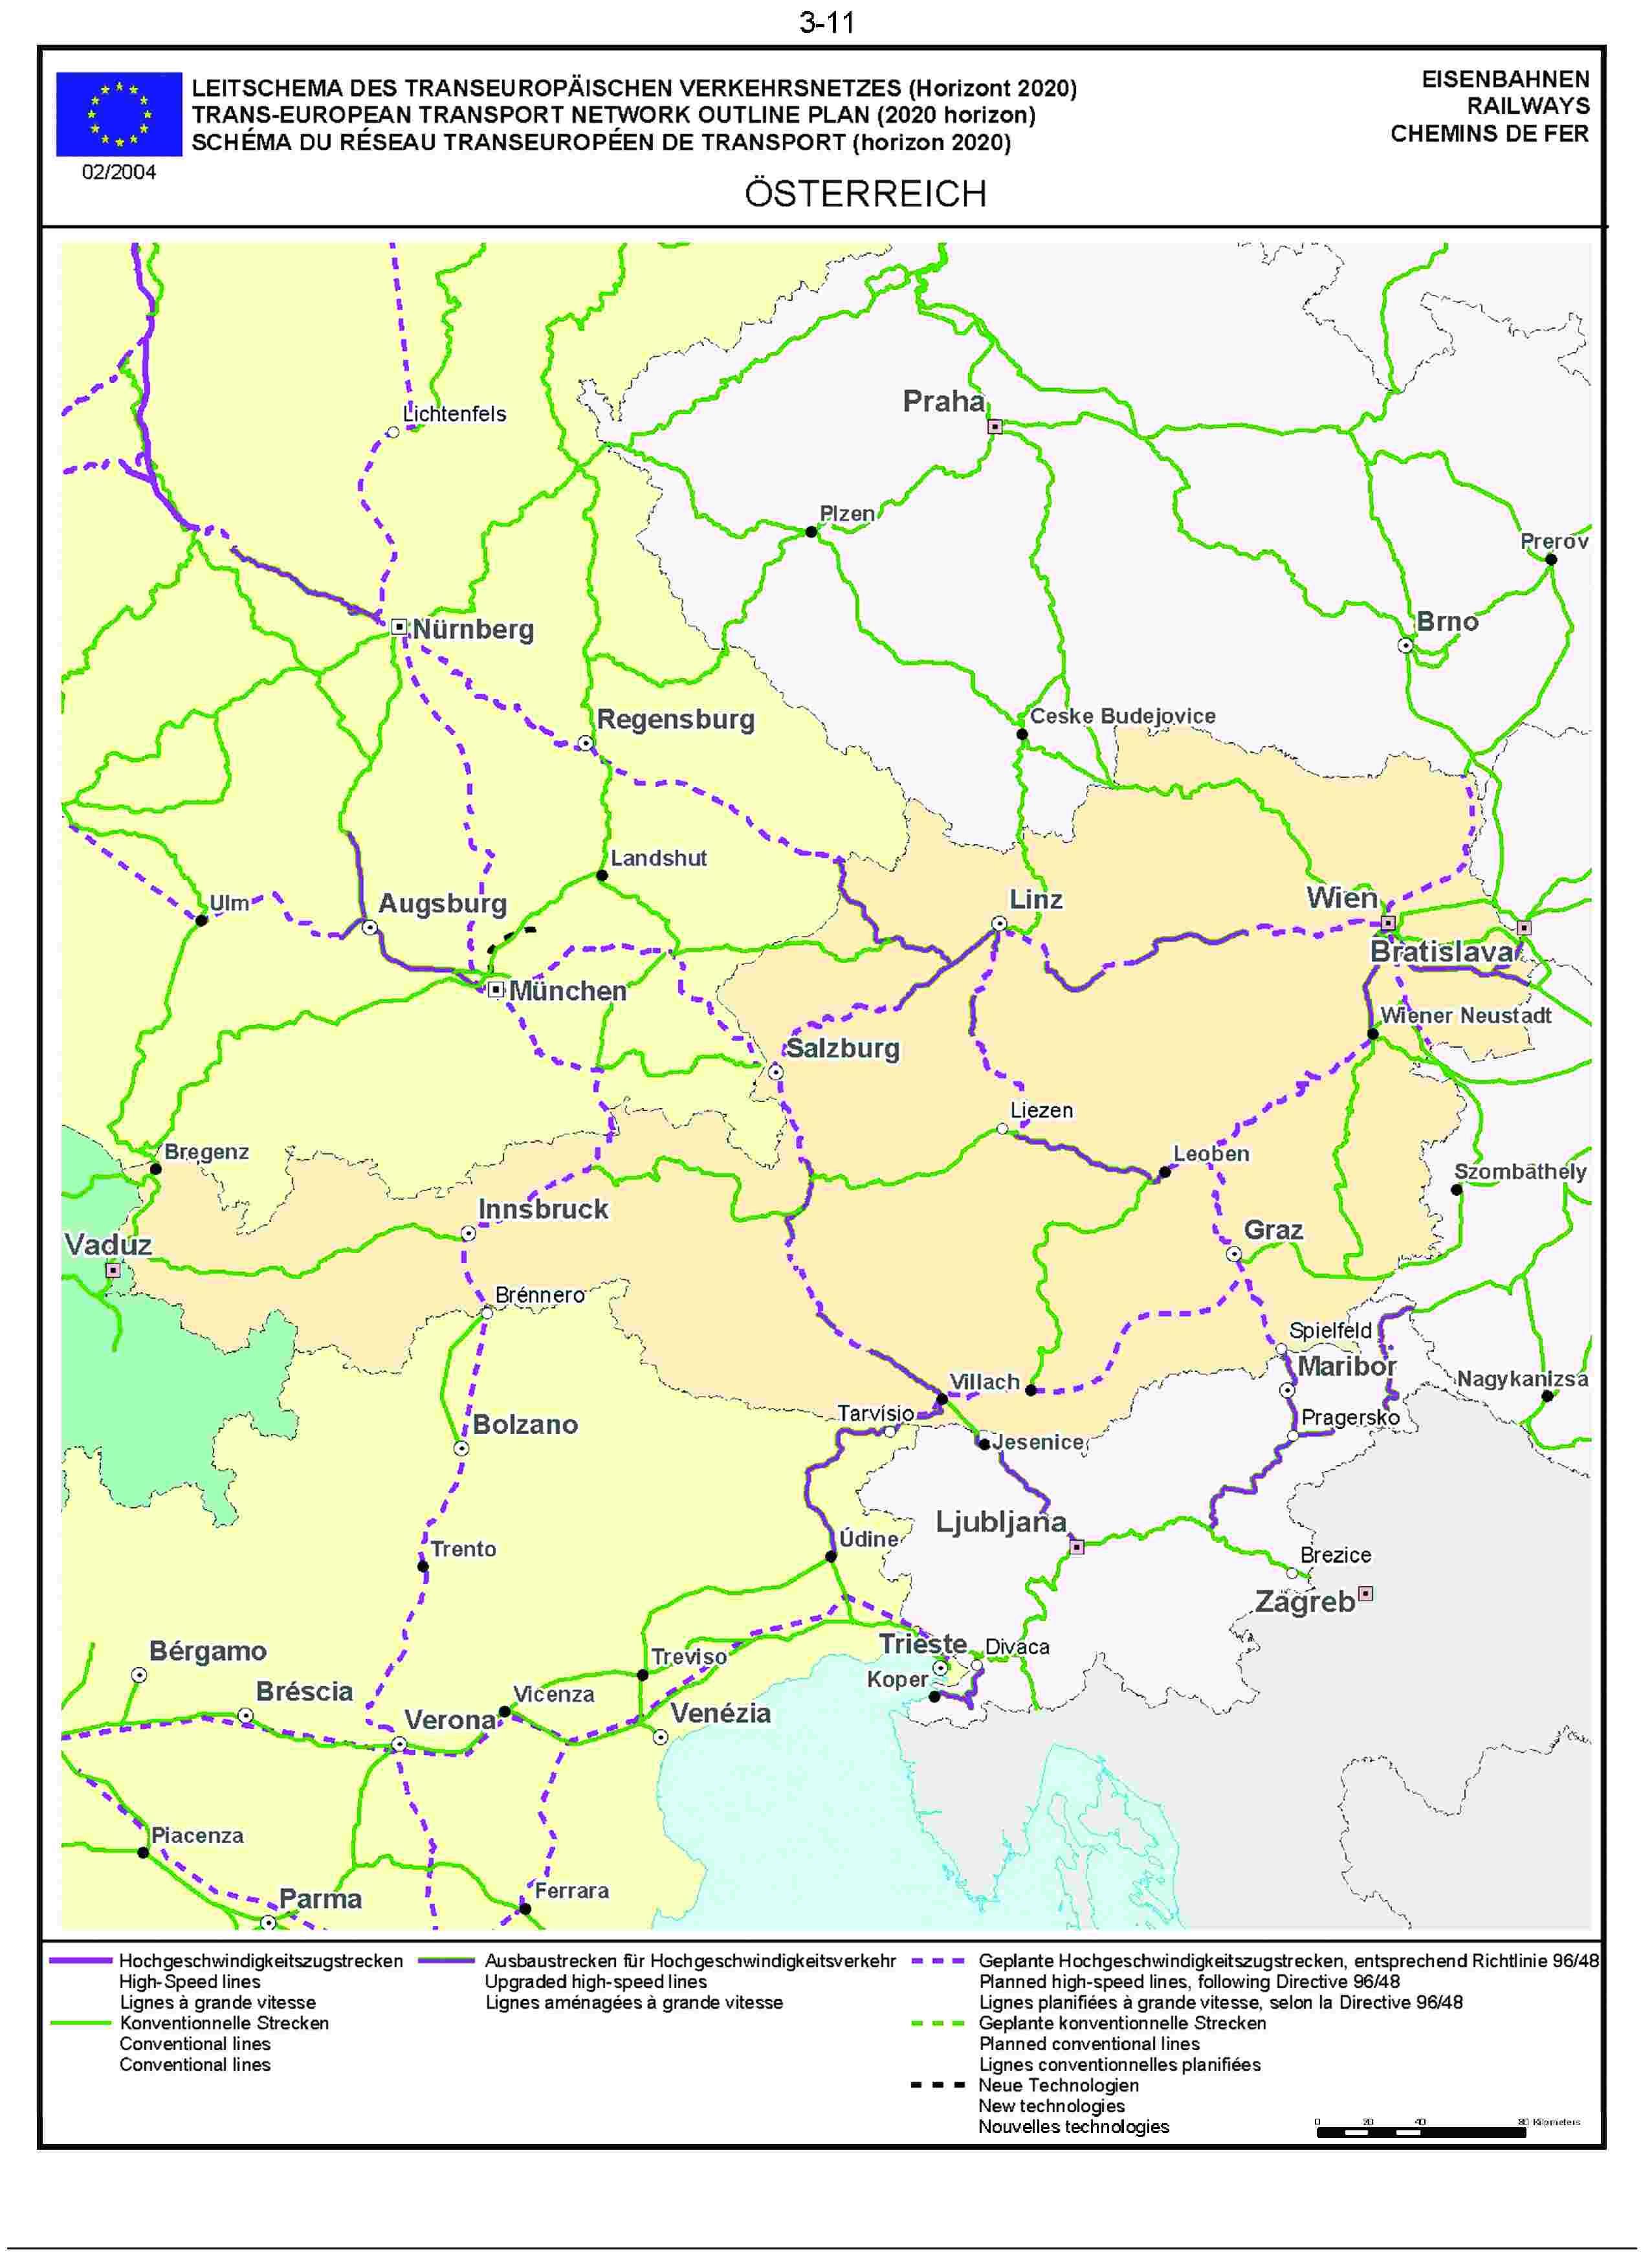 3.11LEITSCHEMA DES TRANSEUROPÄISCHEN VERKEHRSNETZES (Horizont 2020) EISENBAHNENTRANS-EUROPEAN TRANSPORT NETWORK OUTLINE PLAN (2020 horizon) RAILWAYSSCHÉMA DU RÉSEAU TRANSEUROPÉEN DE TRANSPORT (horizon 2020) CHEMINS DE FER02/2004ÖSTERREICH